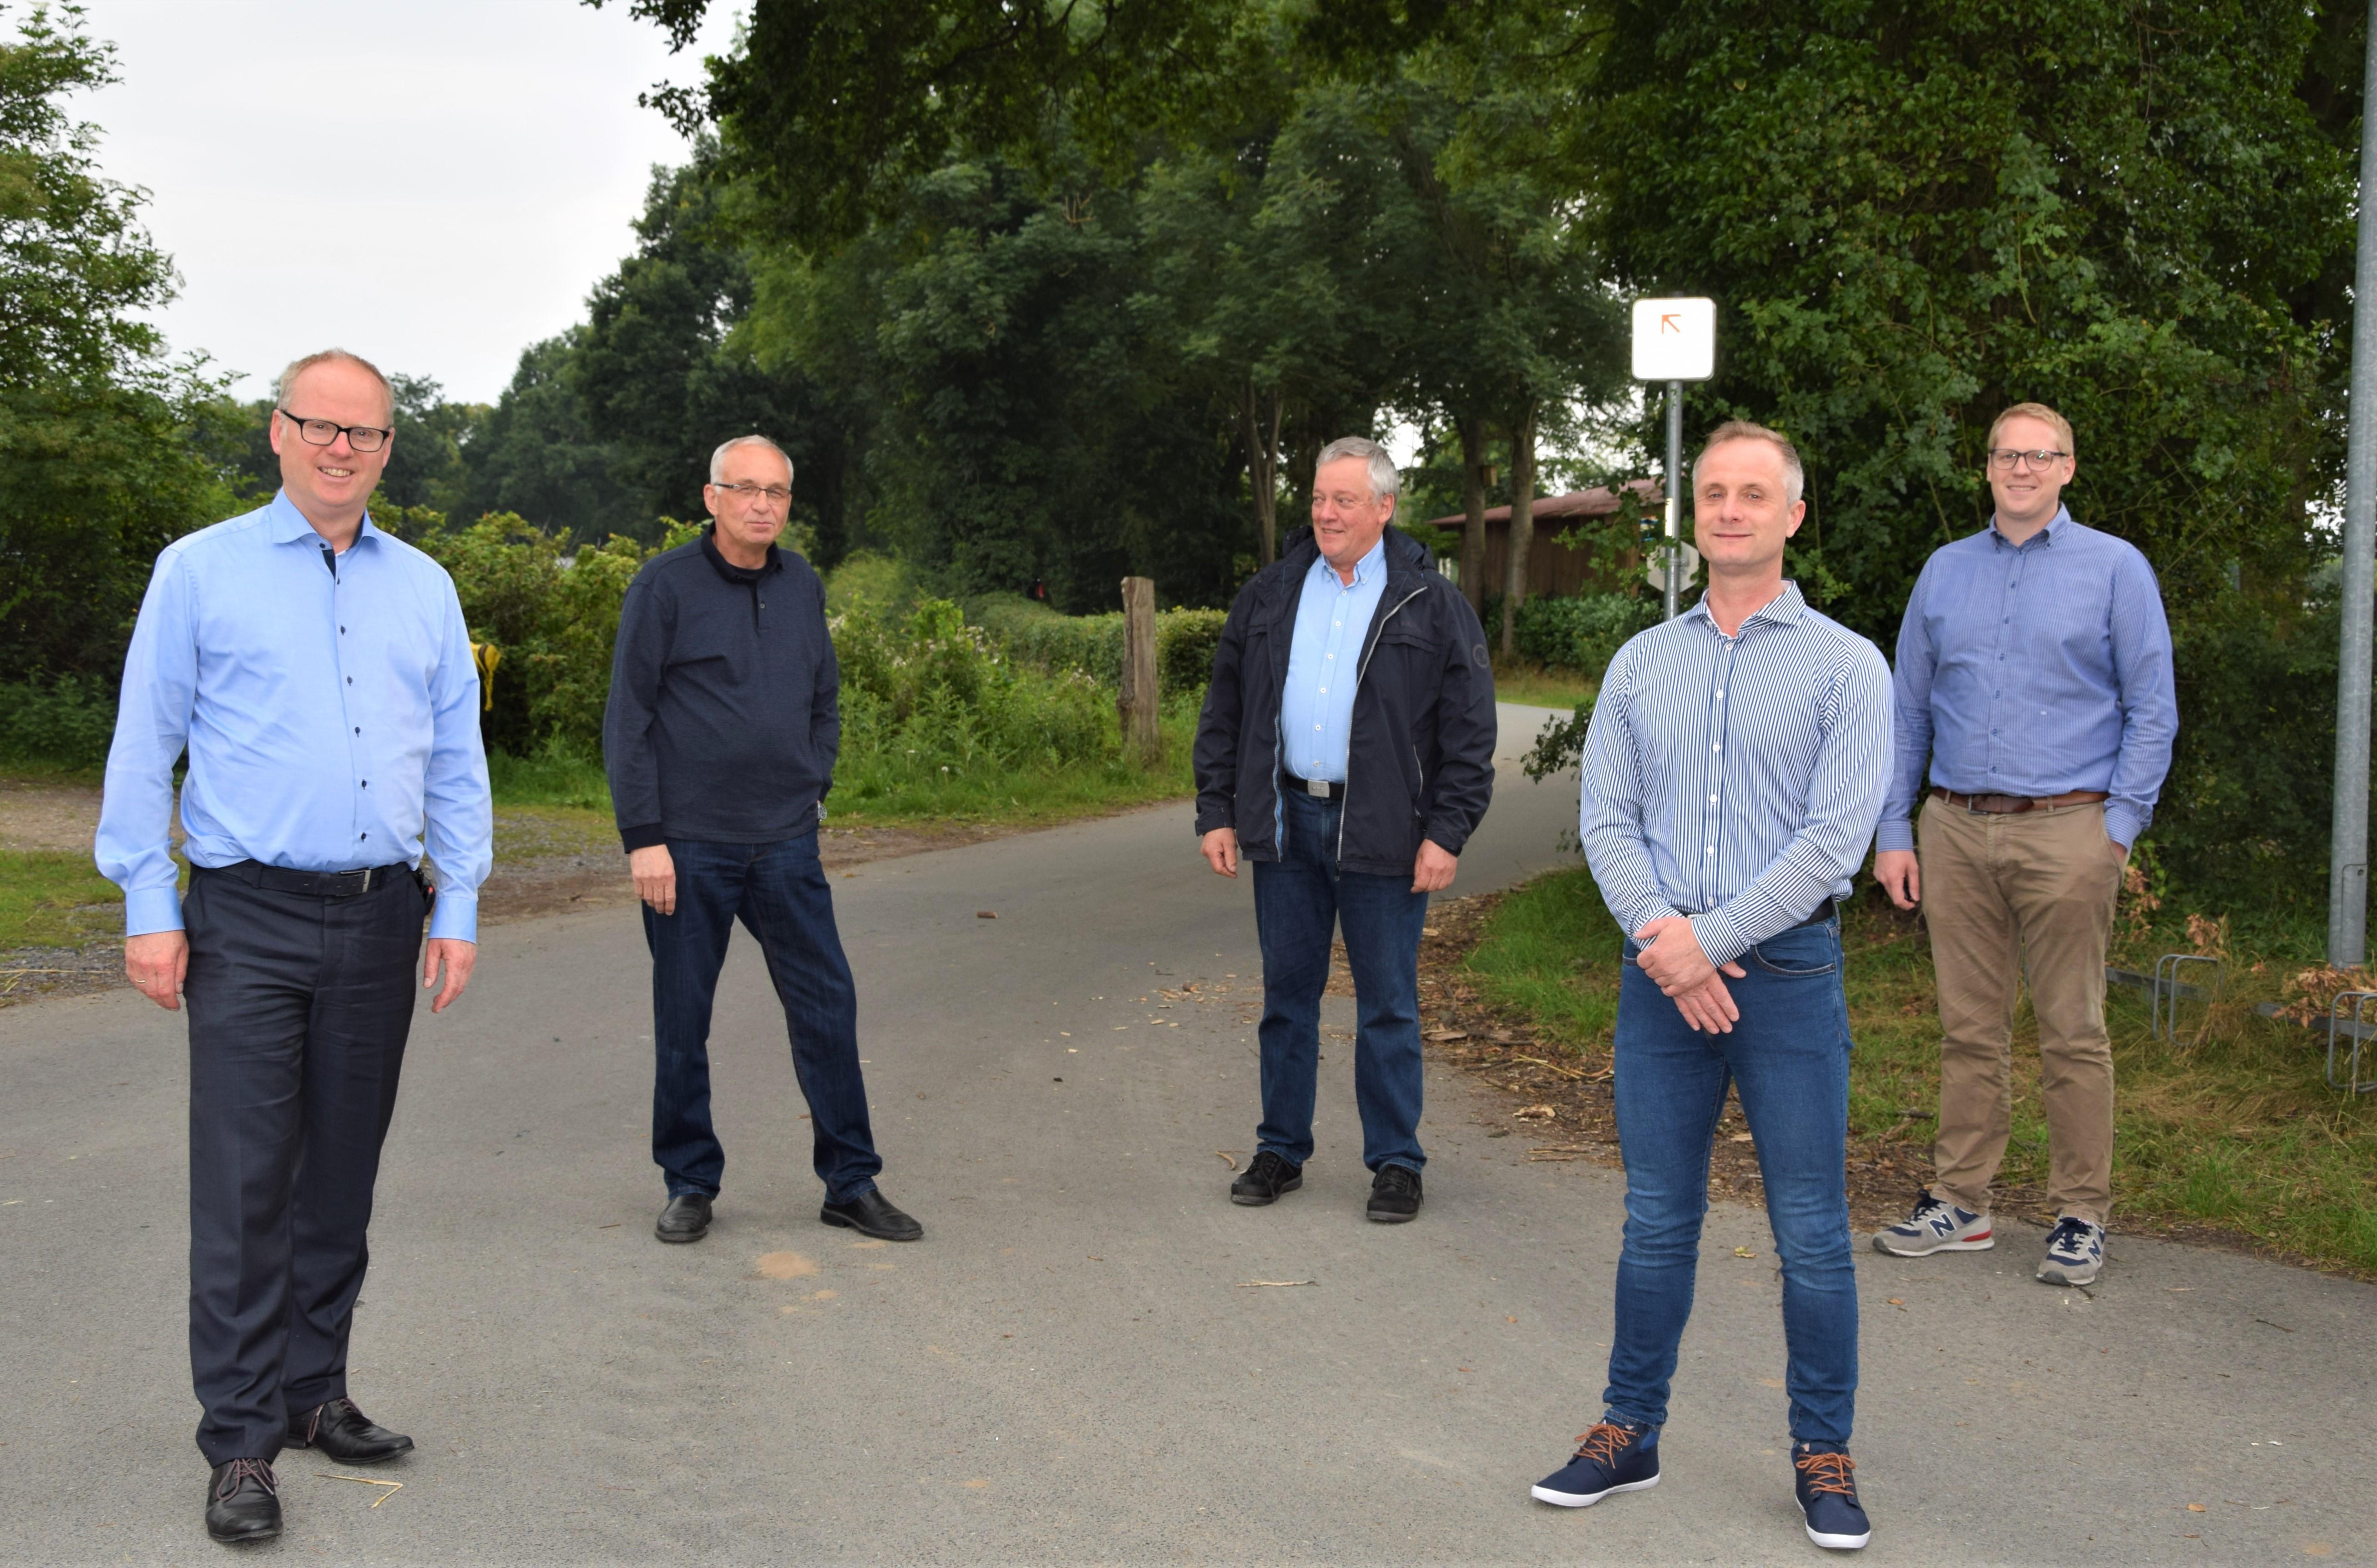 (v.l.n.r.): Mathias Krümpel (CDU-Landratskandidat), Michael Stehr, Gerhard Schomberg (CDU-Vorsitzender), Andreas Effing (Kreistagskandidat), Gary Rottmann